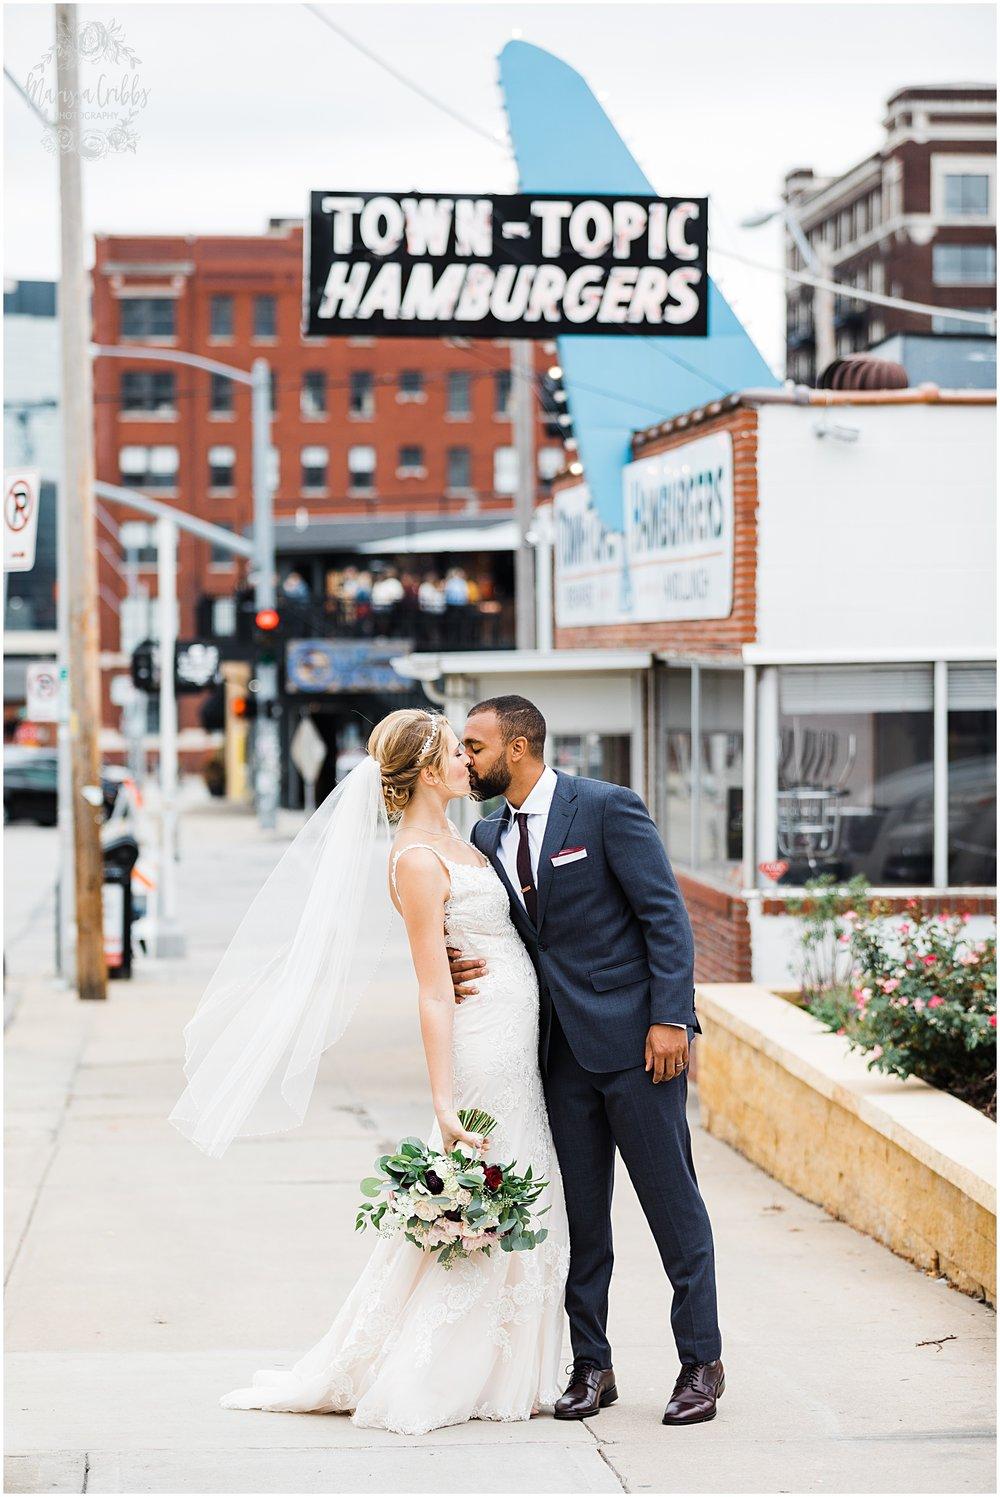 BAUER WEDDING   KELSEA & JUSTIN   MARISSA CRIBBS PHOTOGRAPHY_6537.jpg